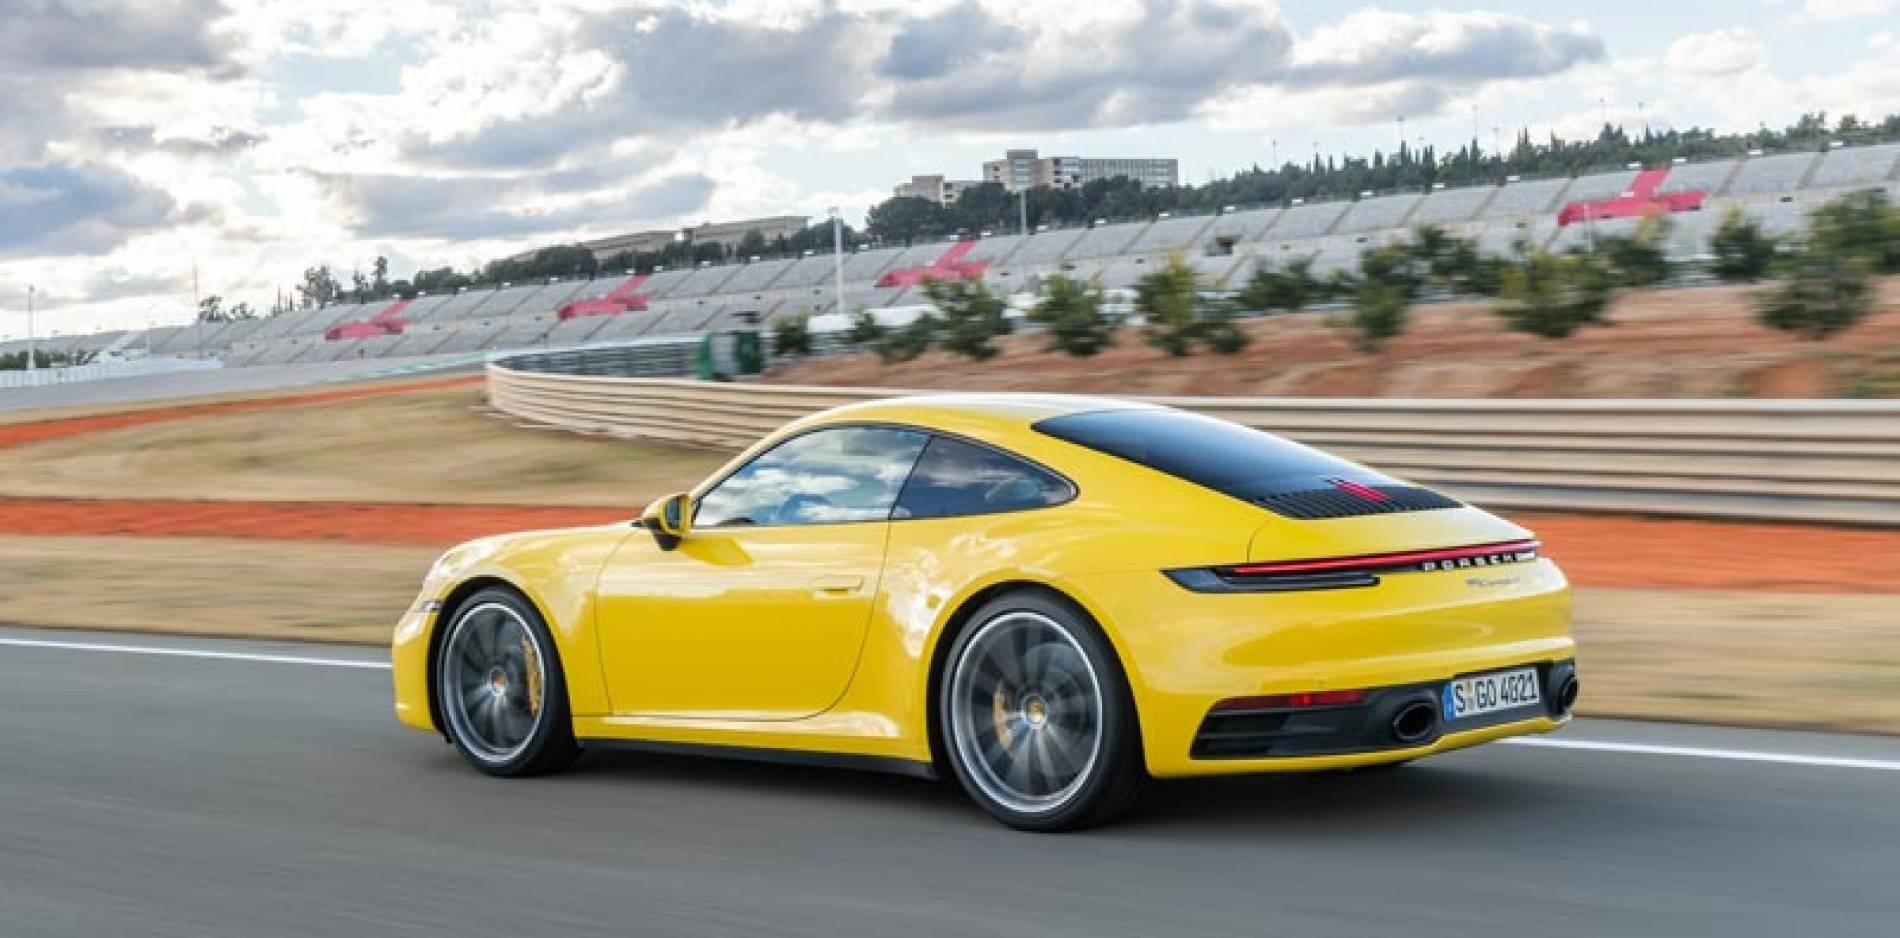 Prueba Porsche 911, la leyenda continúa